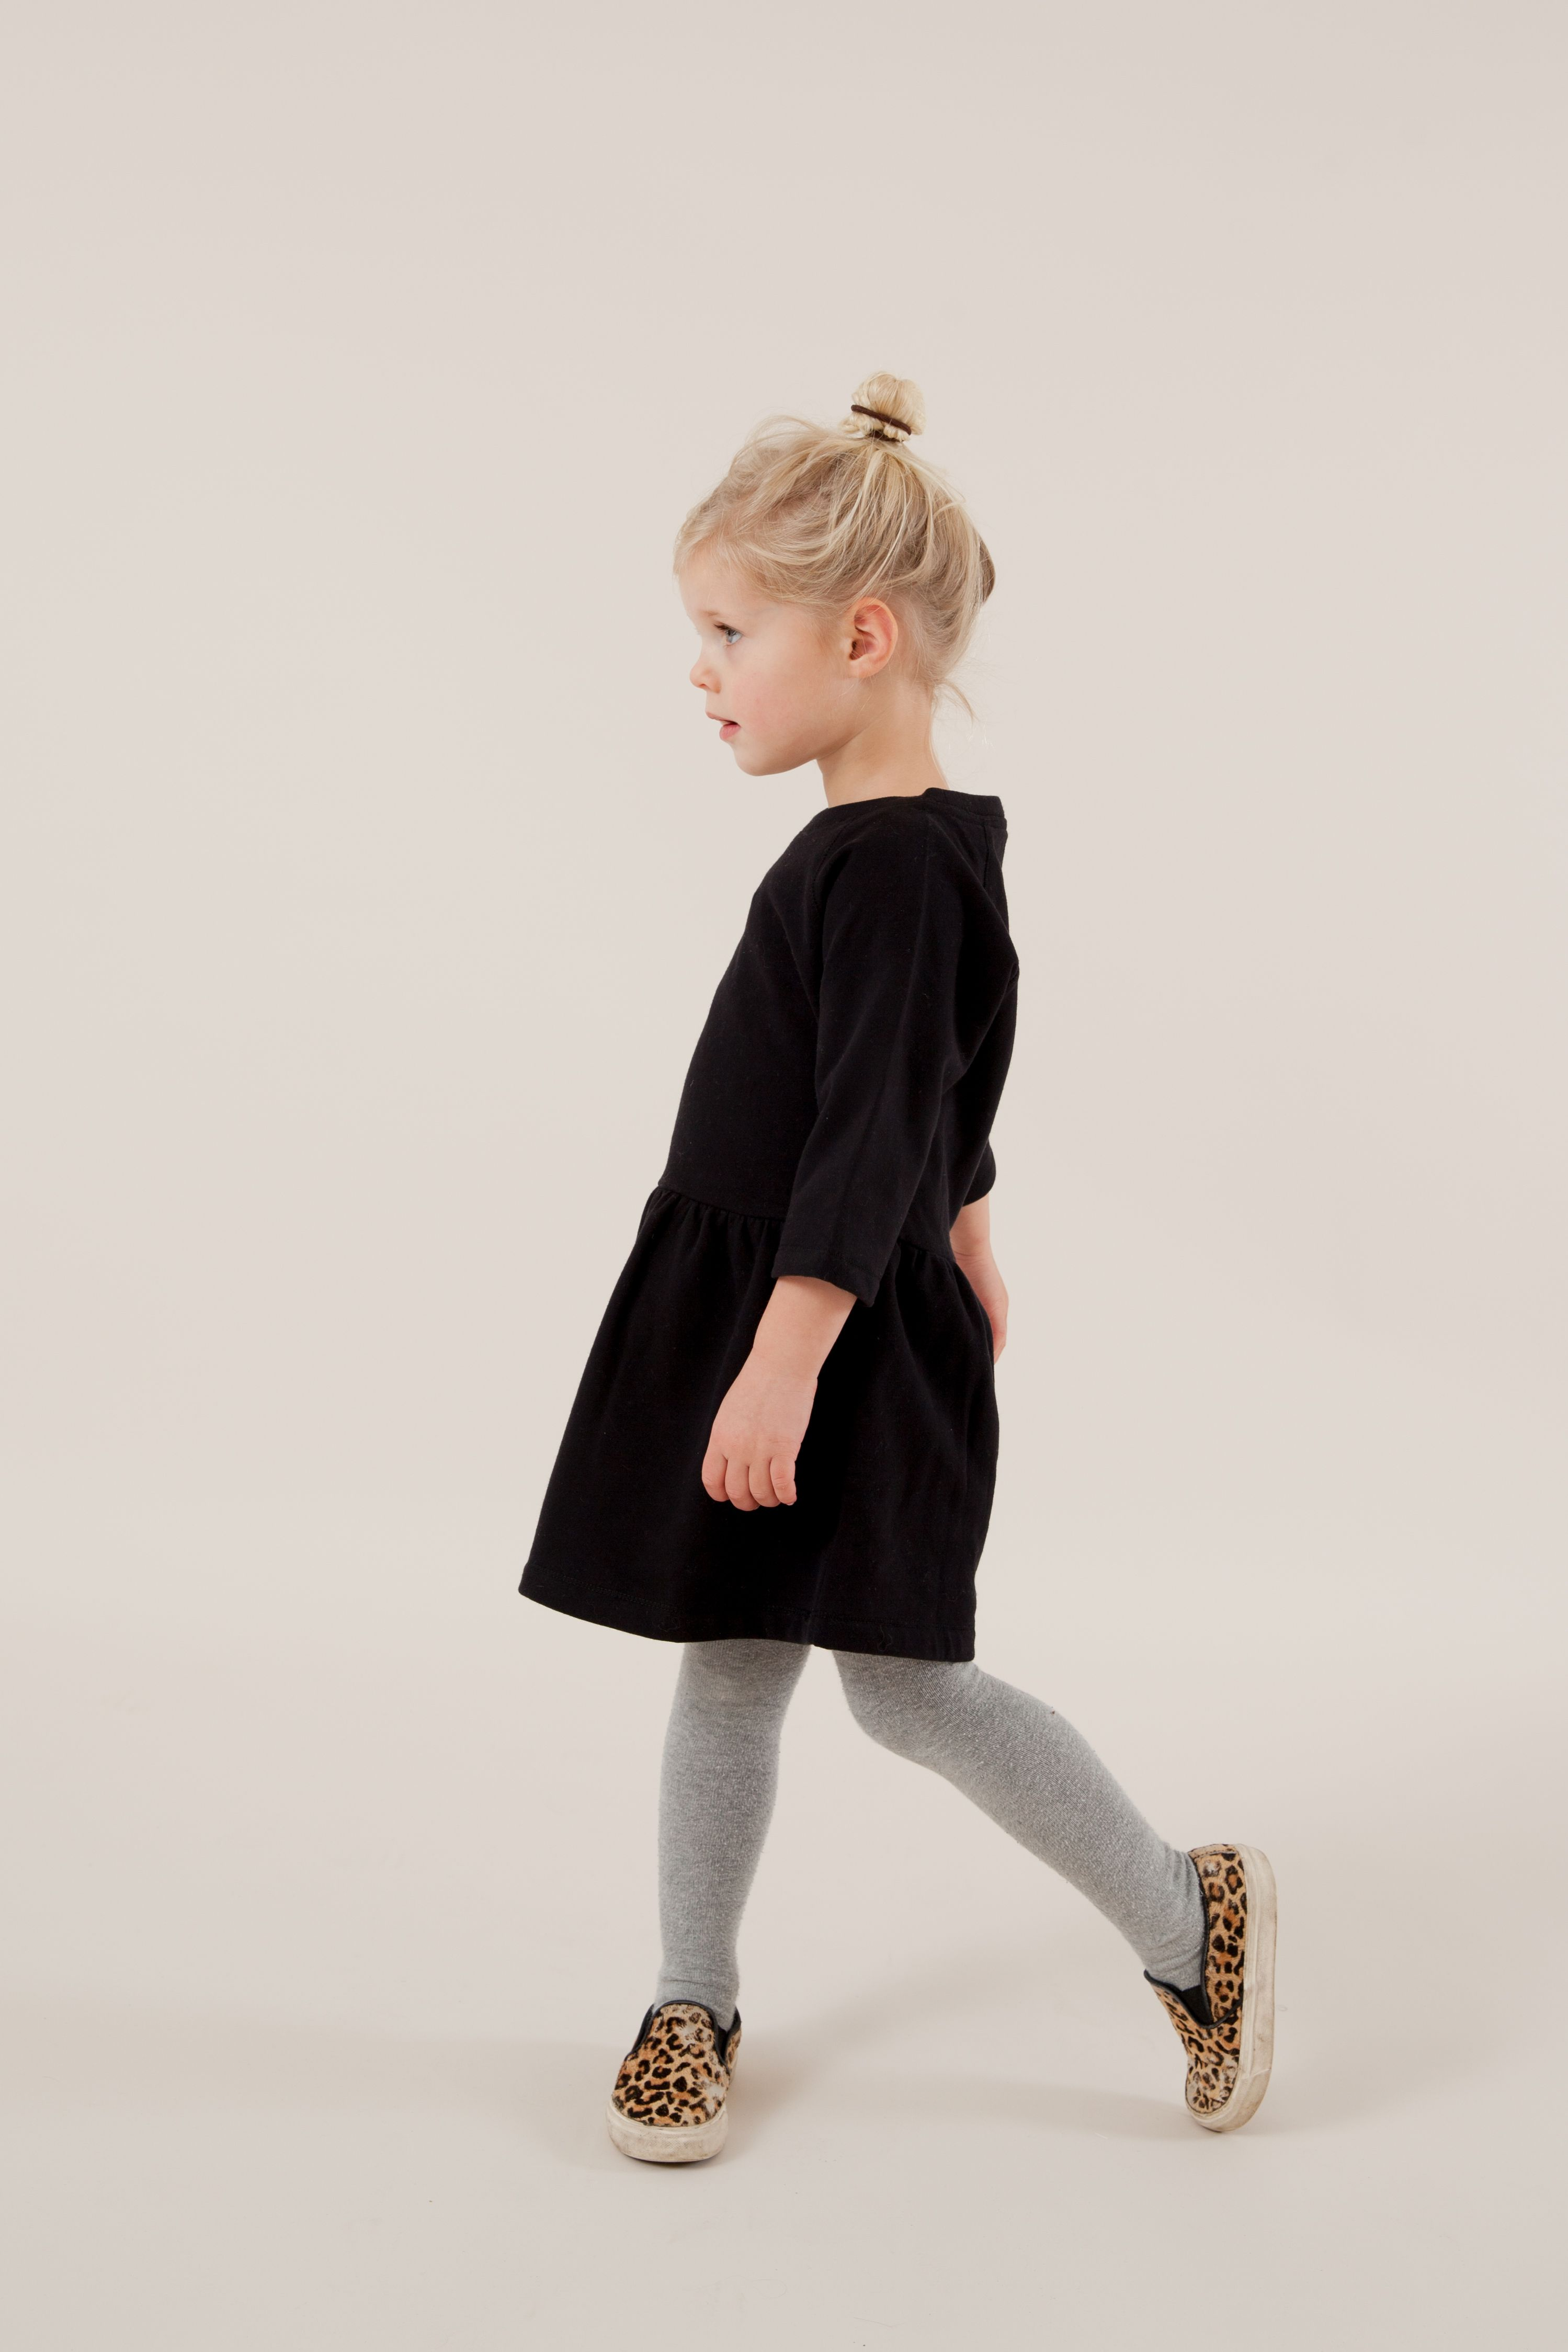 Kinderkleding Webshop.Gray Label Aw15 Dress Nearly Black Autumn Winter Dress